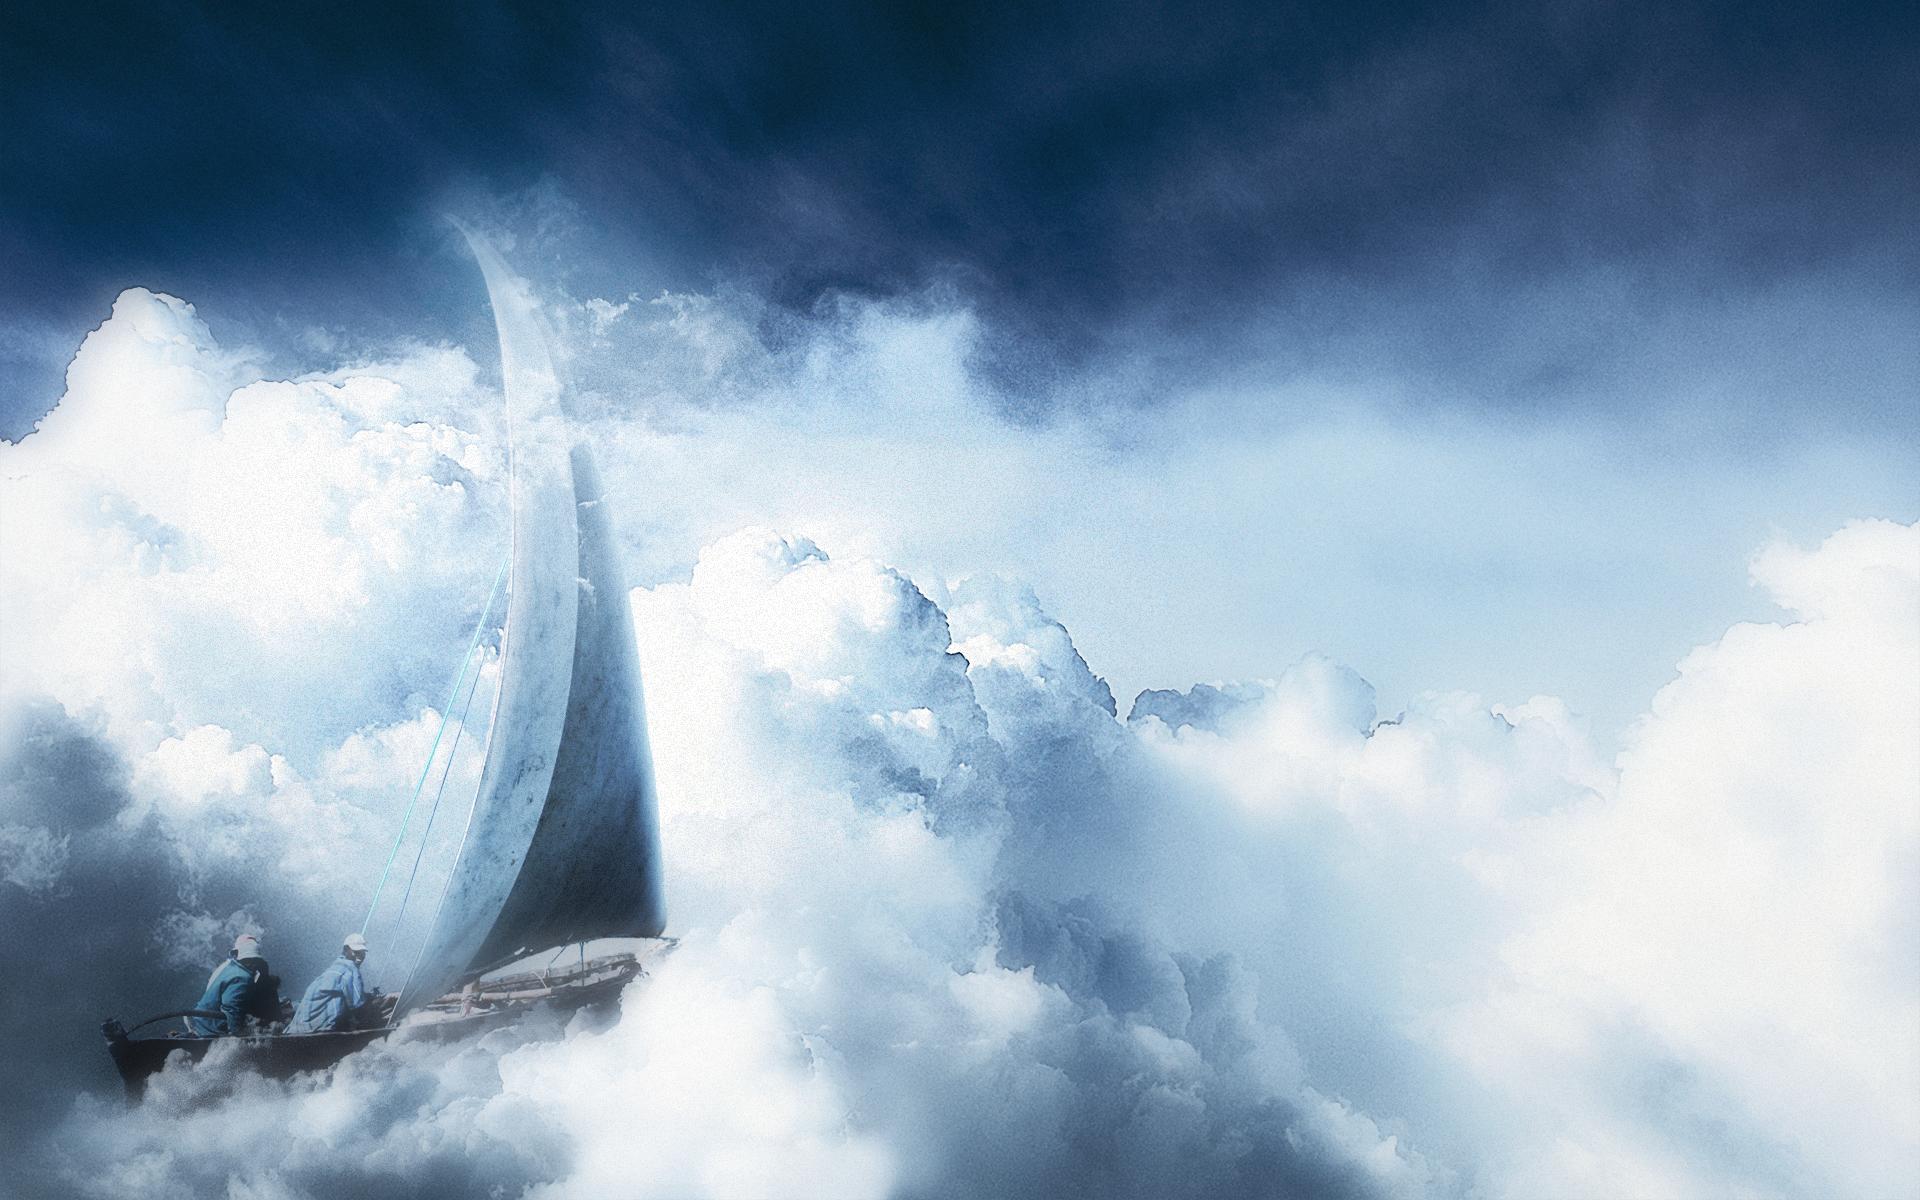 Dreamy Cloud by D-R-A-C-O on DeviantArt